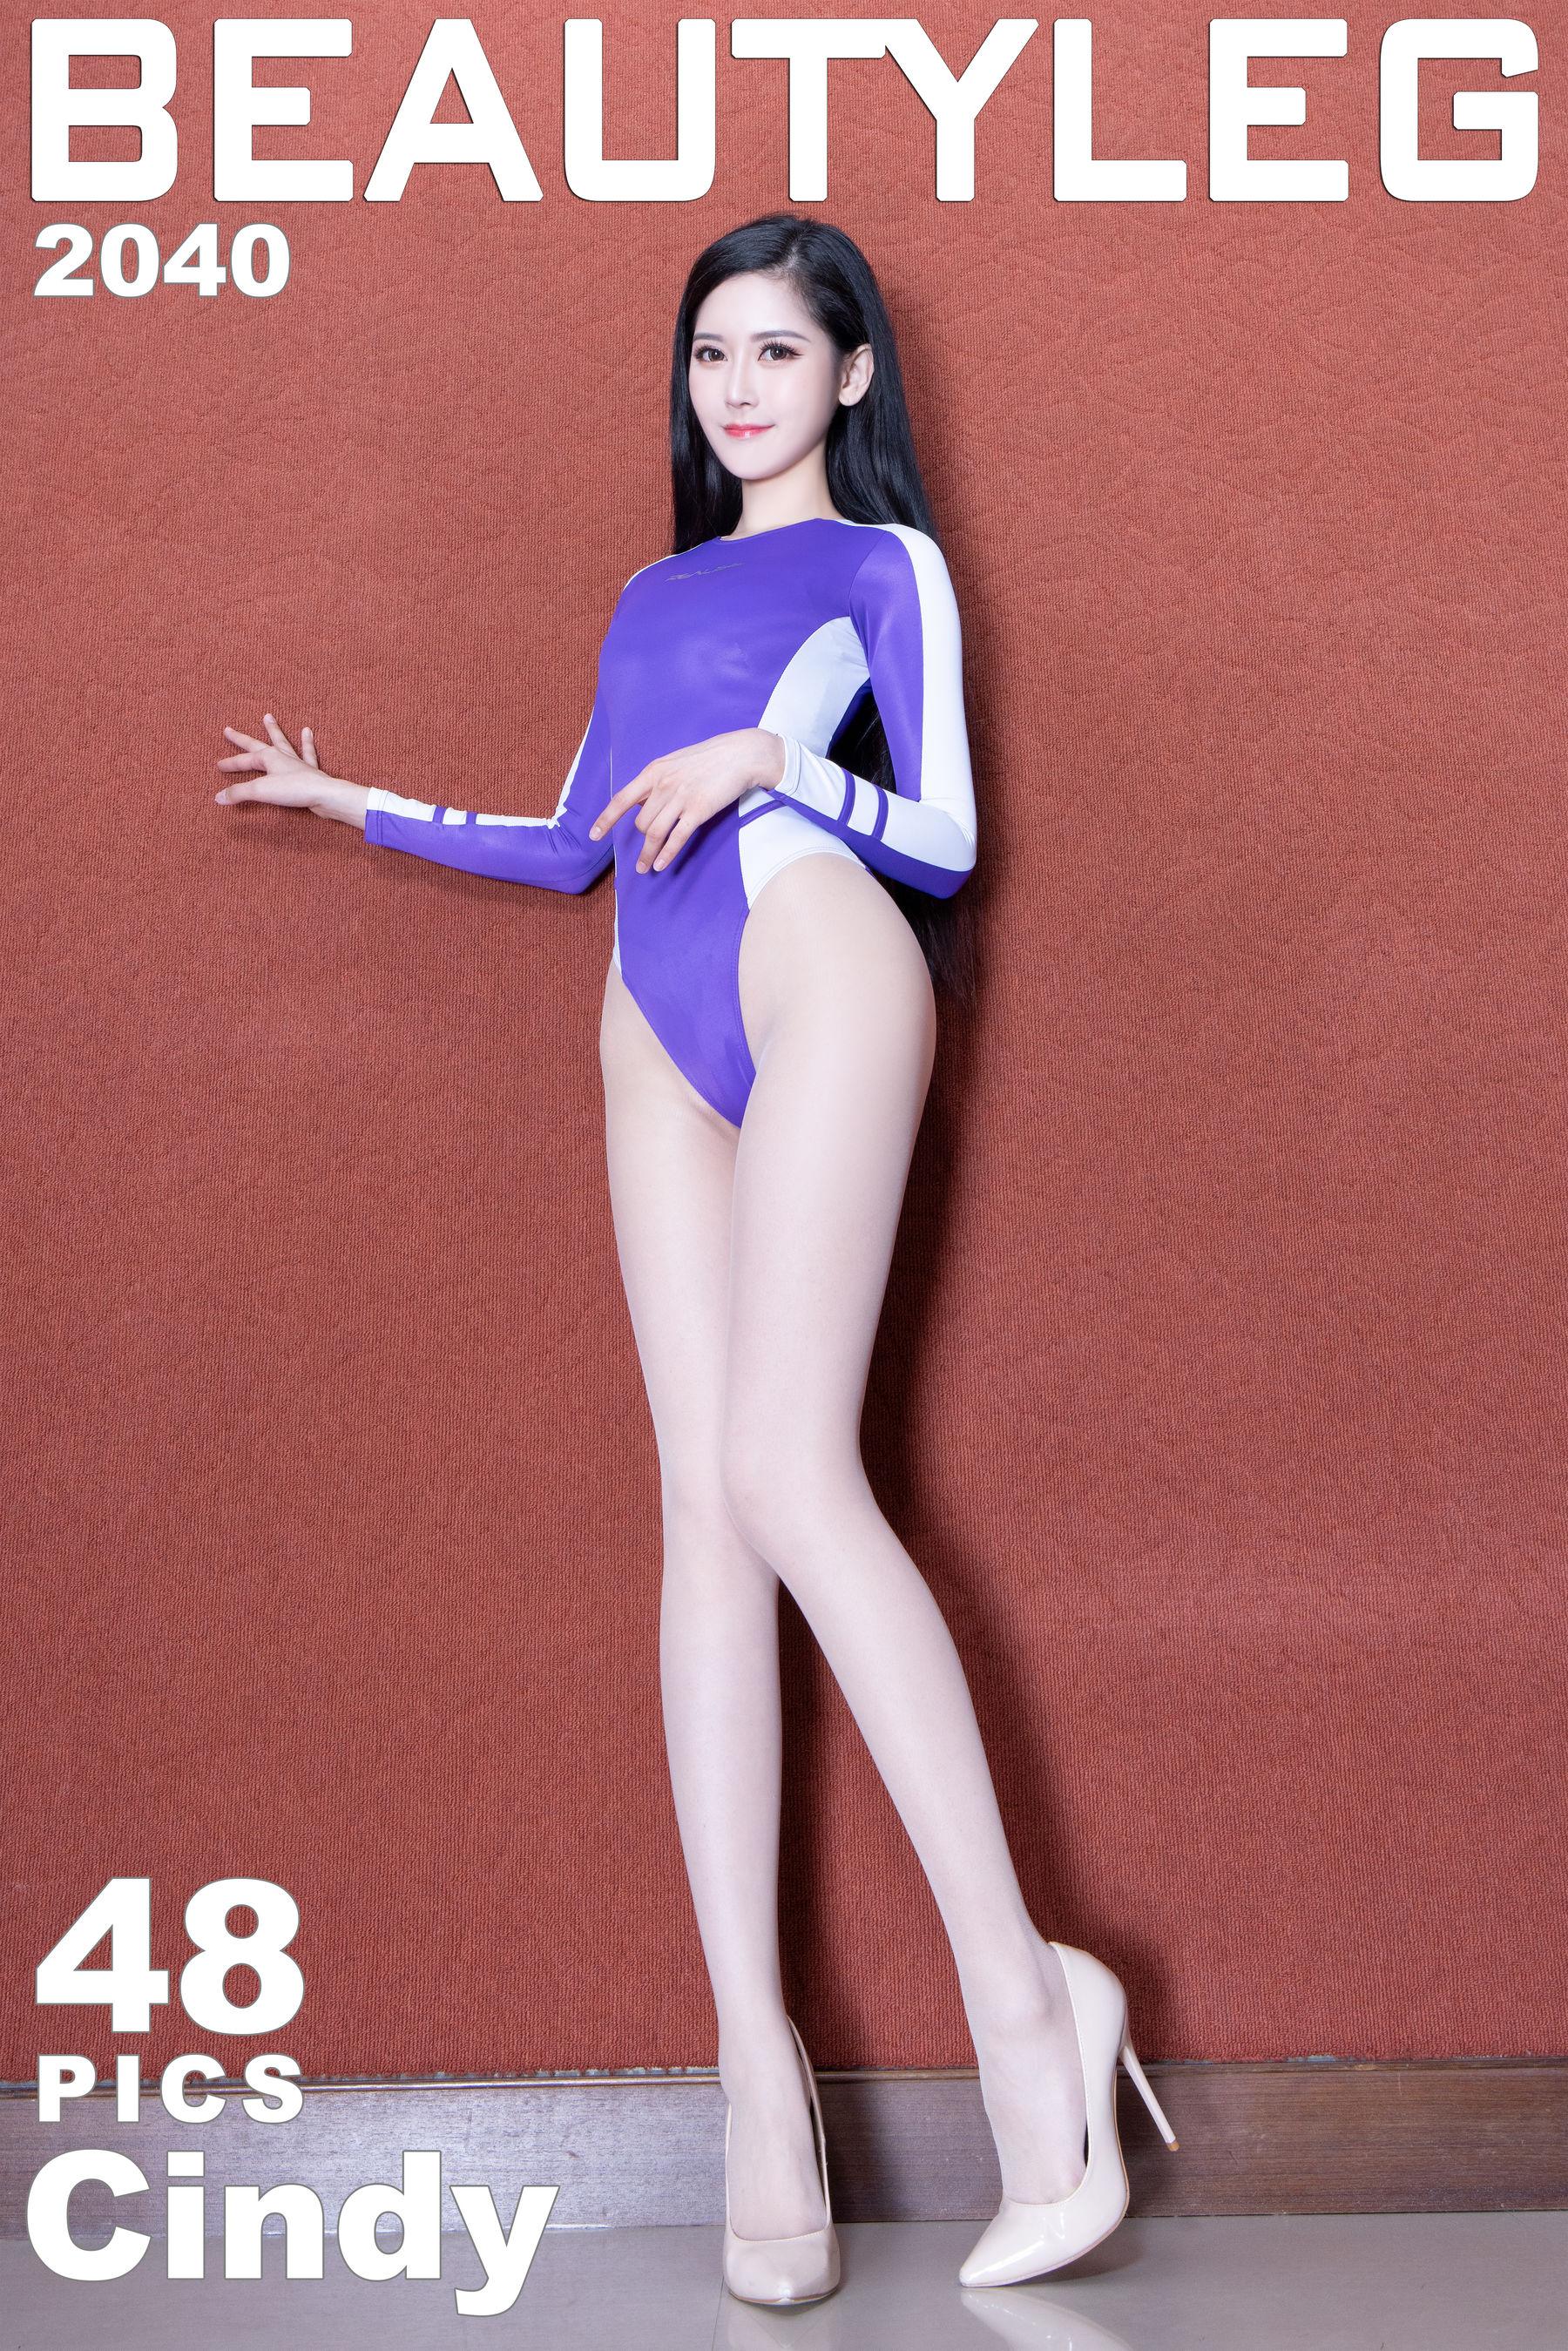 VOL.1935 [Beautyleg]肉丝美腿:腿模Cindy(Cindy)超高清个人性感漂亮大图(48P)